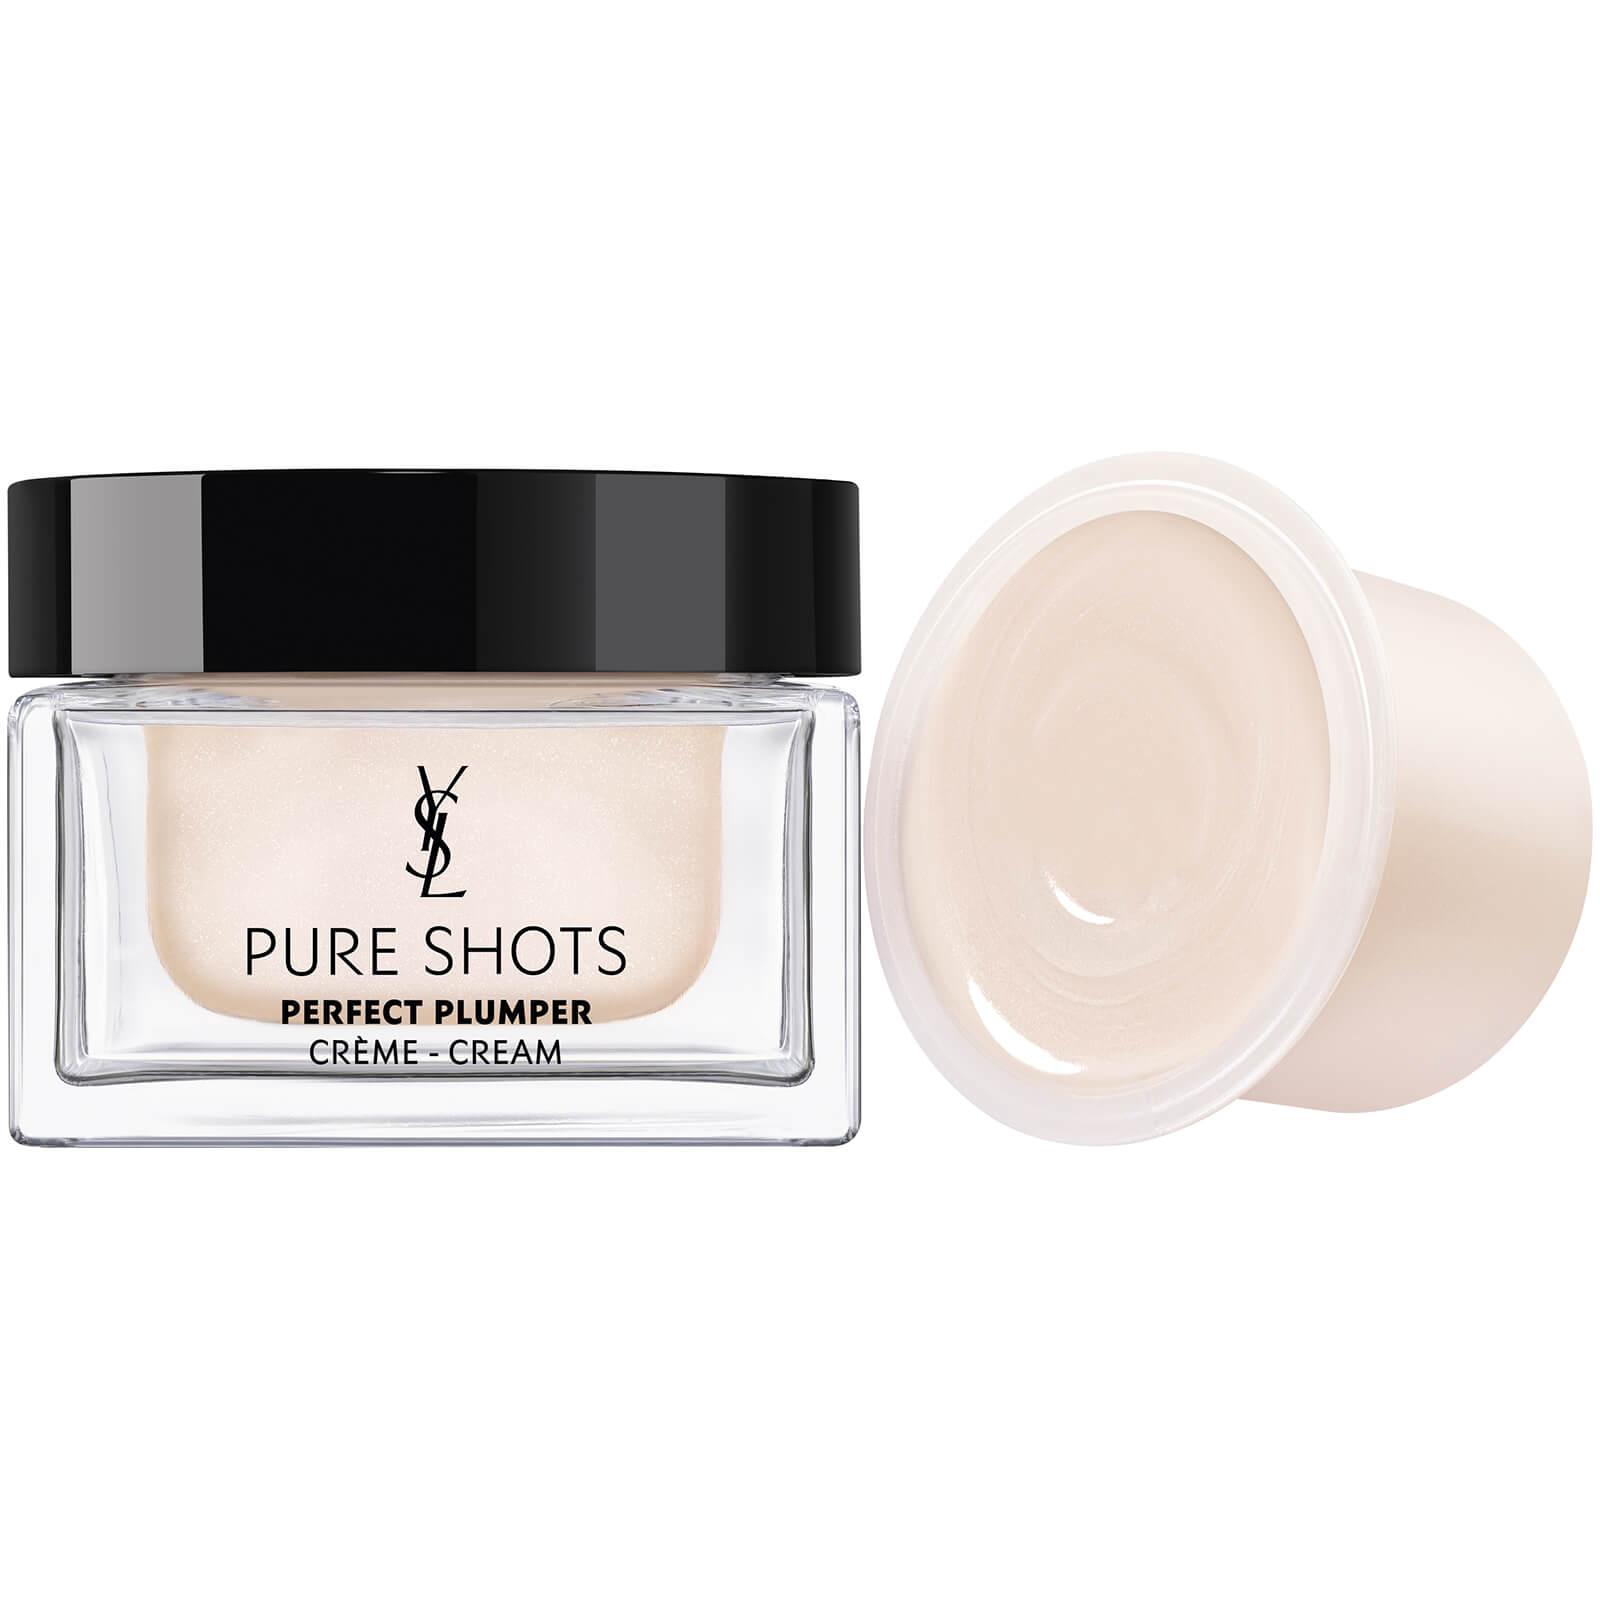 Yves Saint Laurent Pure Shots Perfect Plumper Cream 50ml (Various Types) - Perfect Plumper Recharge